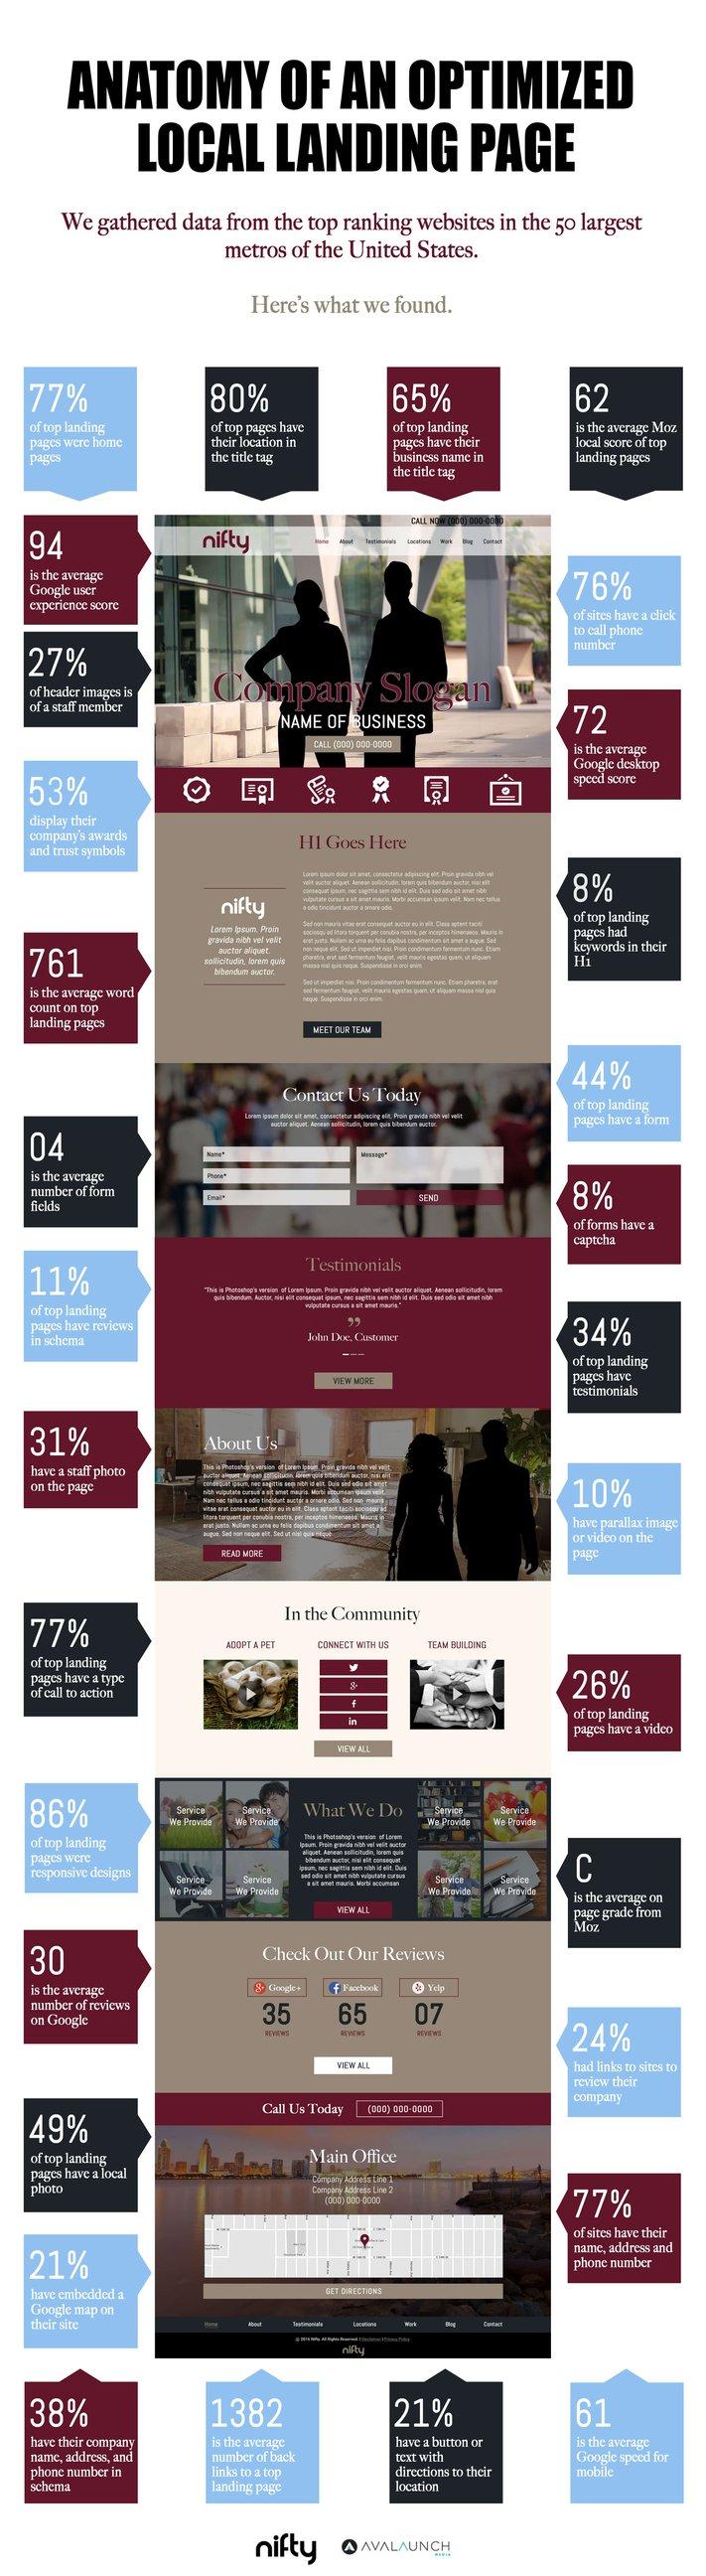 nifty_landingpage_infographic.jpg